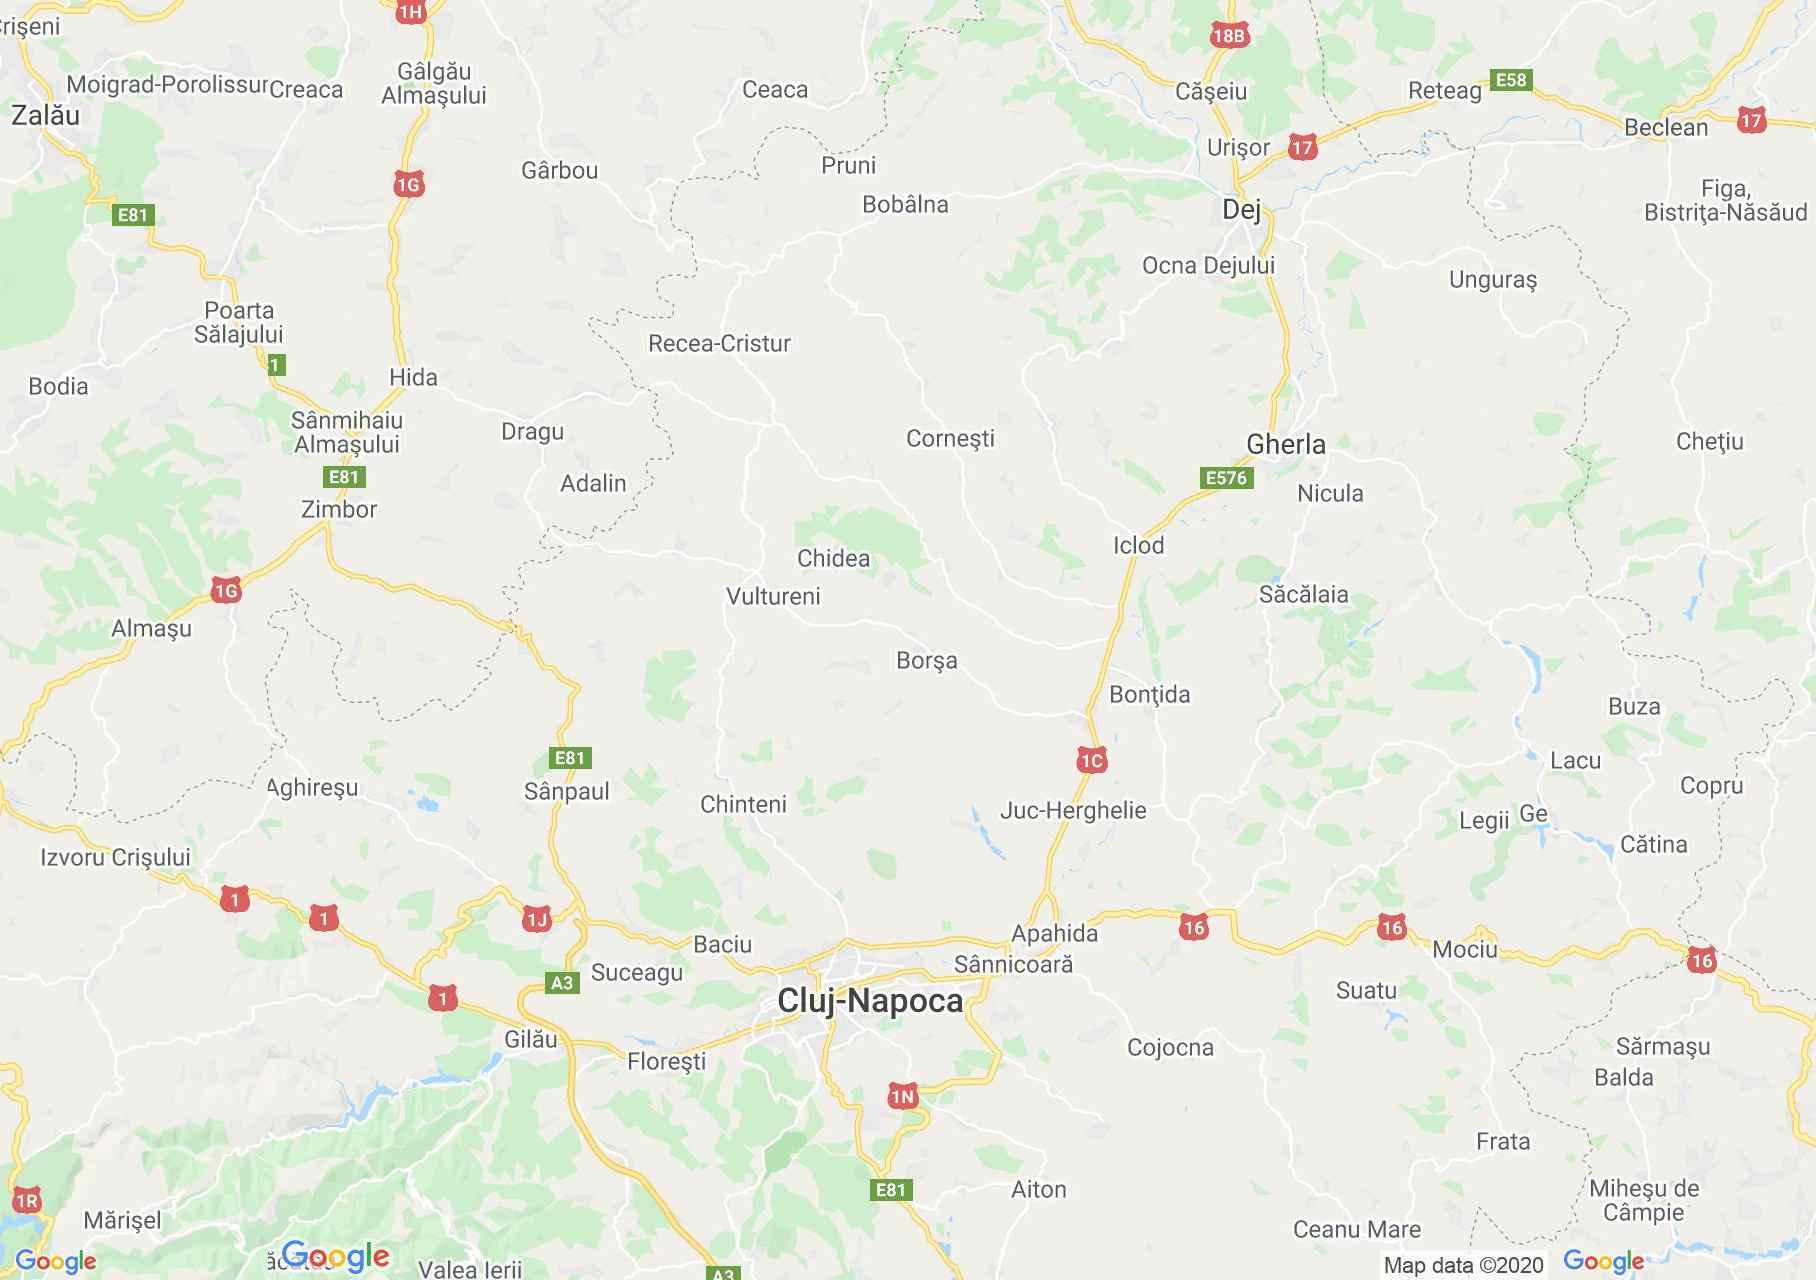 Folklor: Hóstát - Kolozsvári népviselet  (térkép)